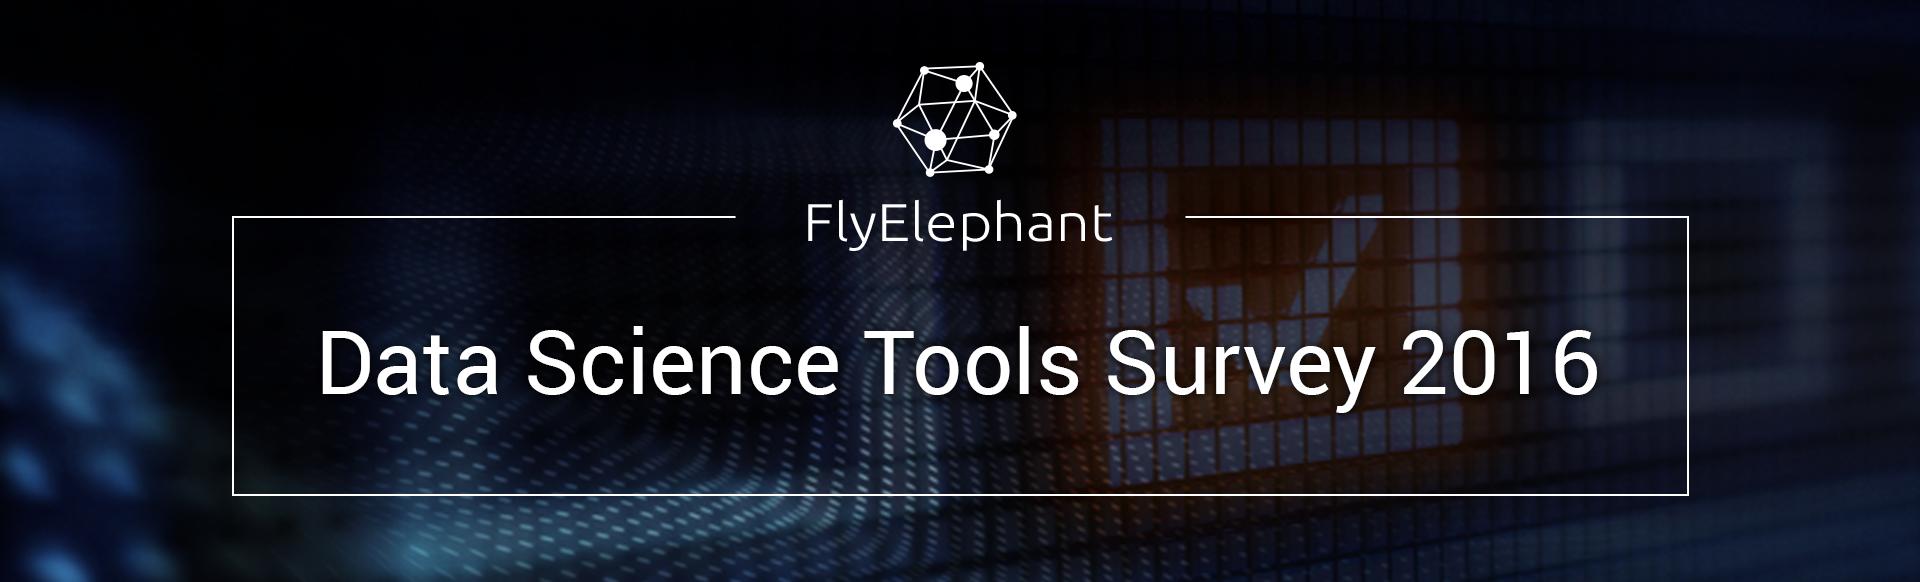 Опрос Data Science Tools - 1